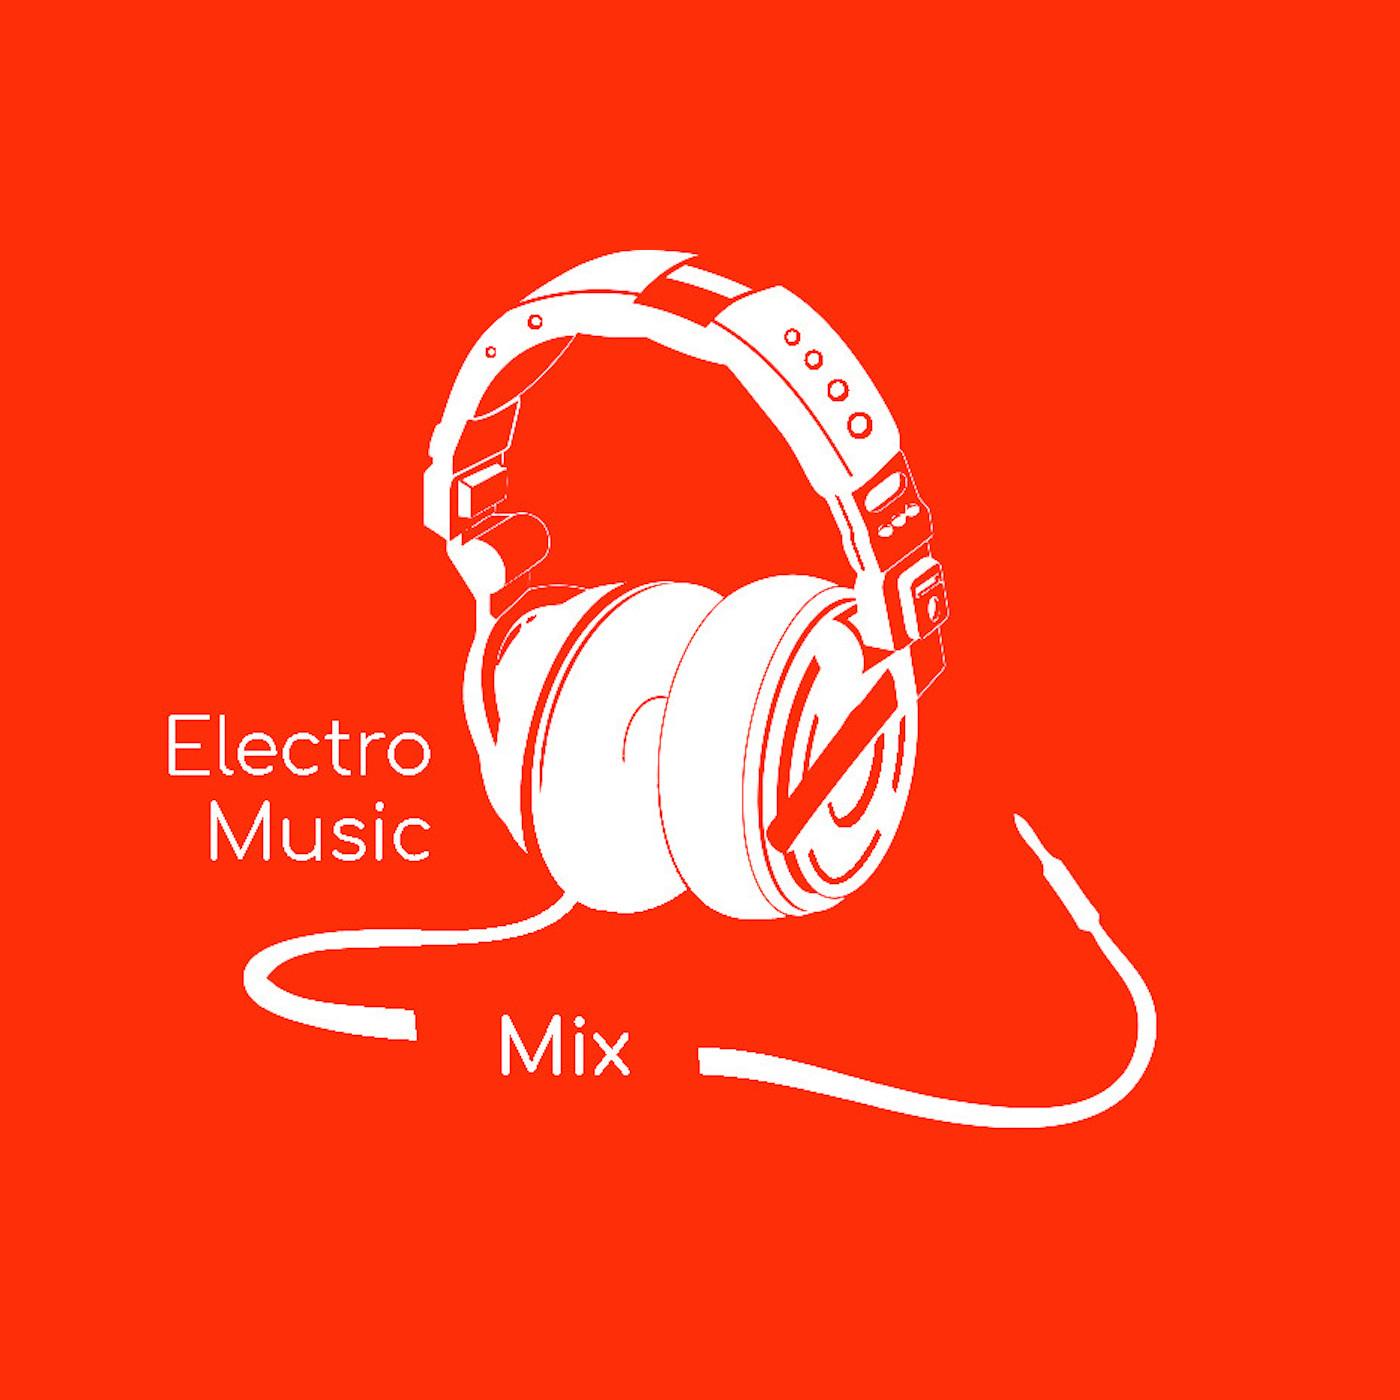 Podcast Electro Music Mix